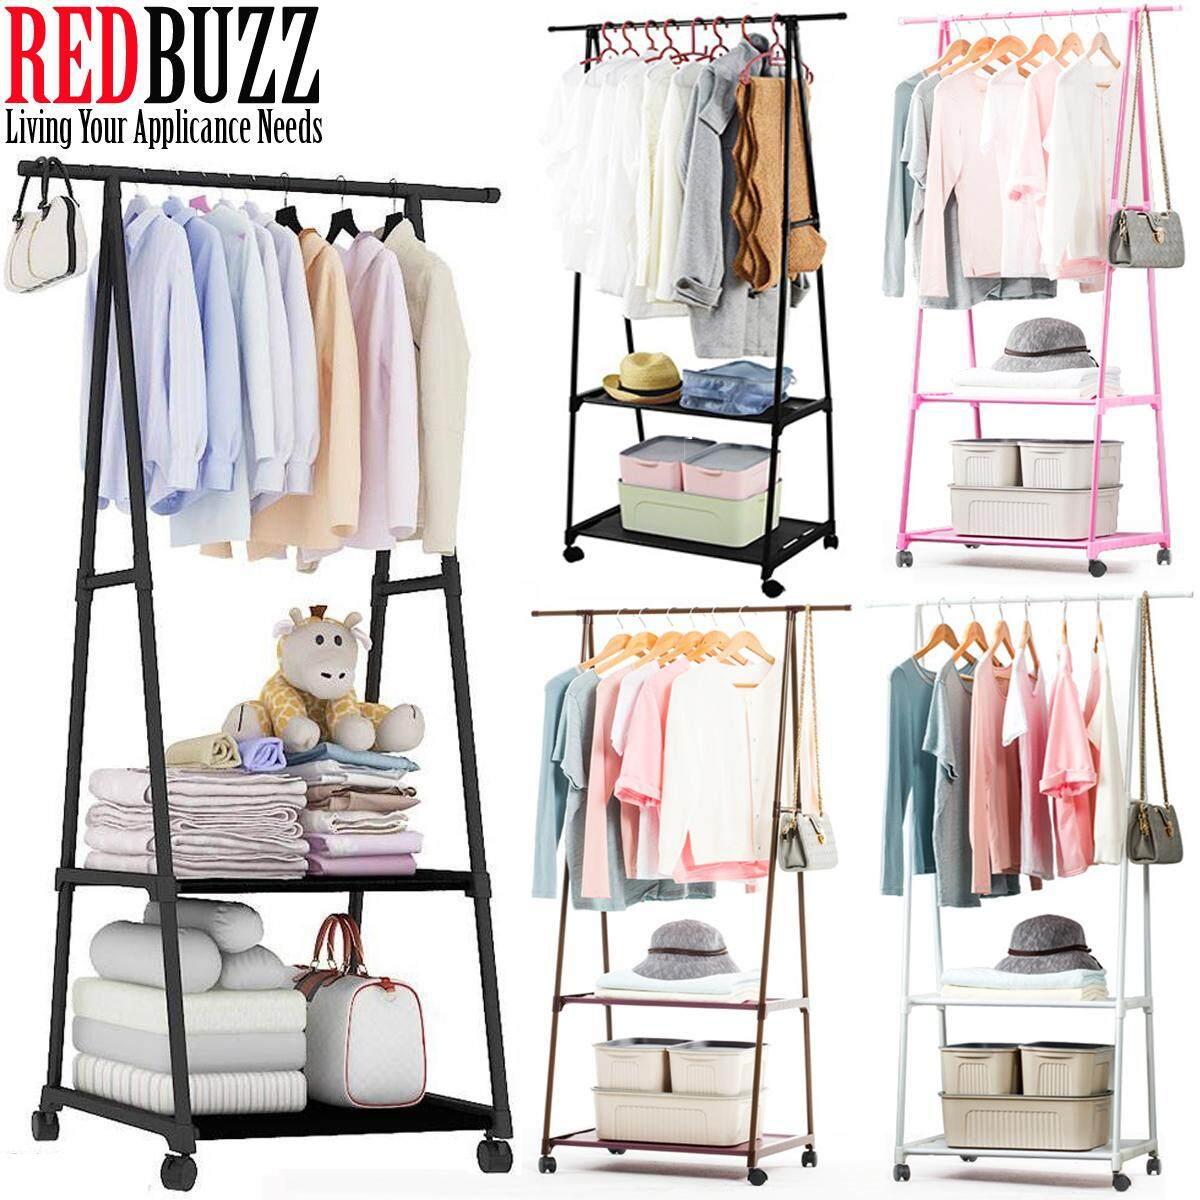 REDBUZZ Metal Clothes Rack Cloth Rack Hanging Organizer Drying Rack